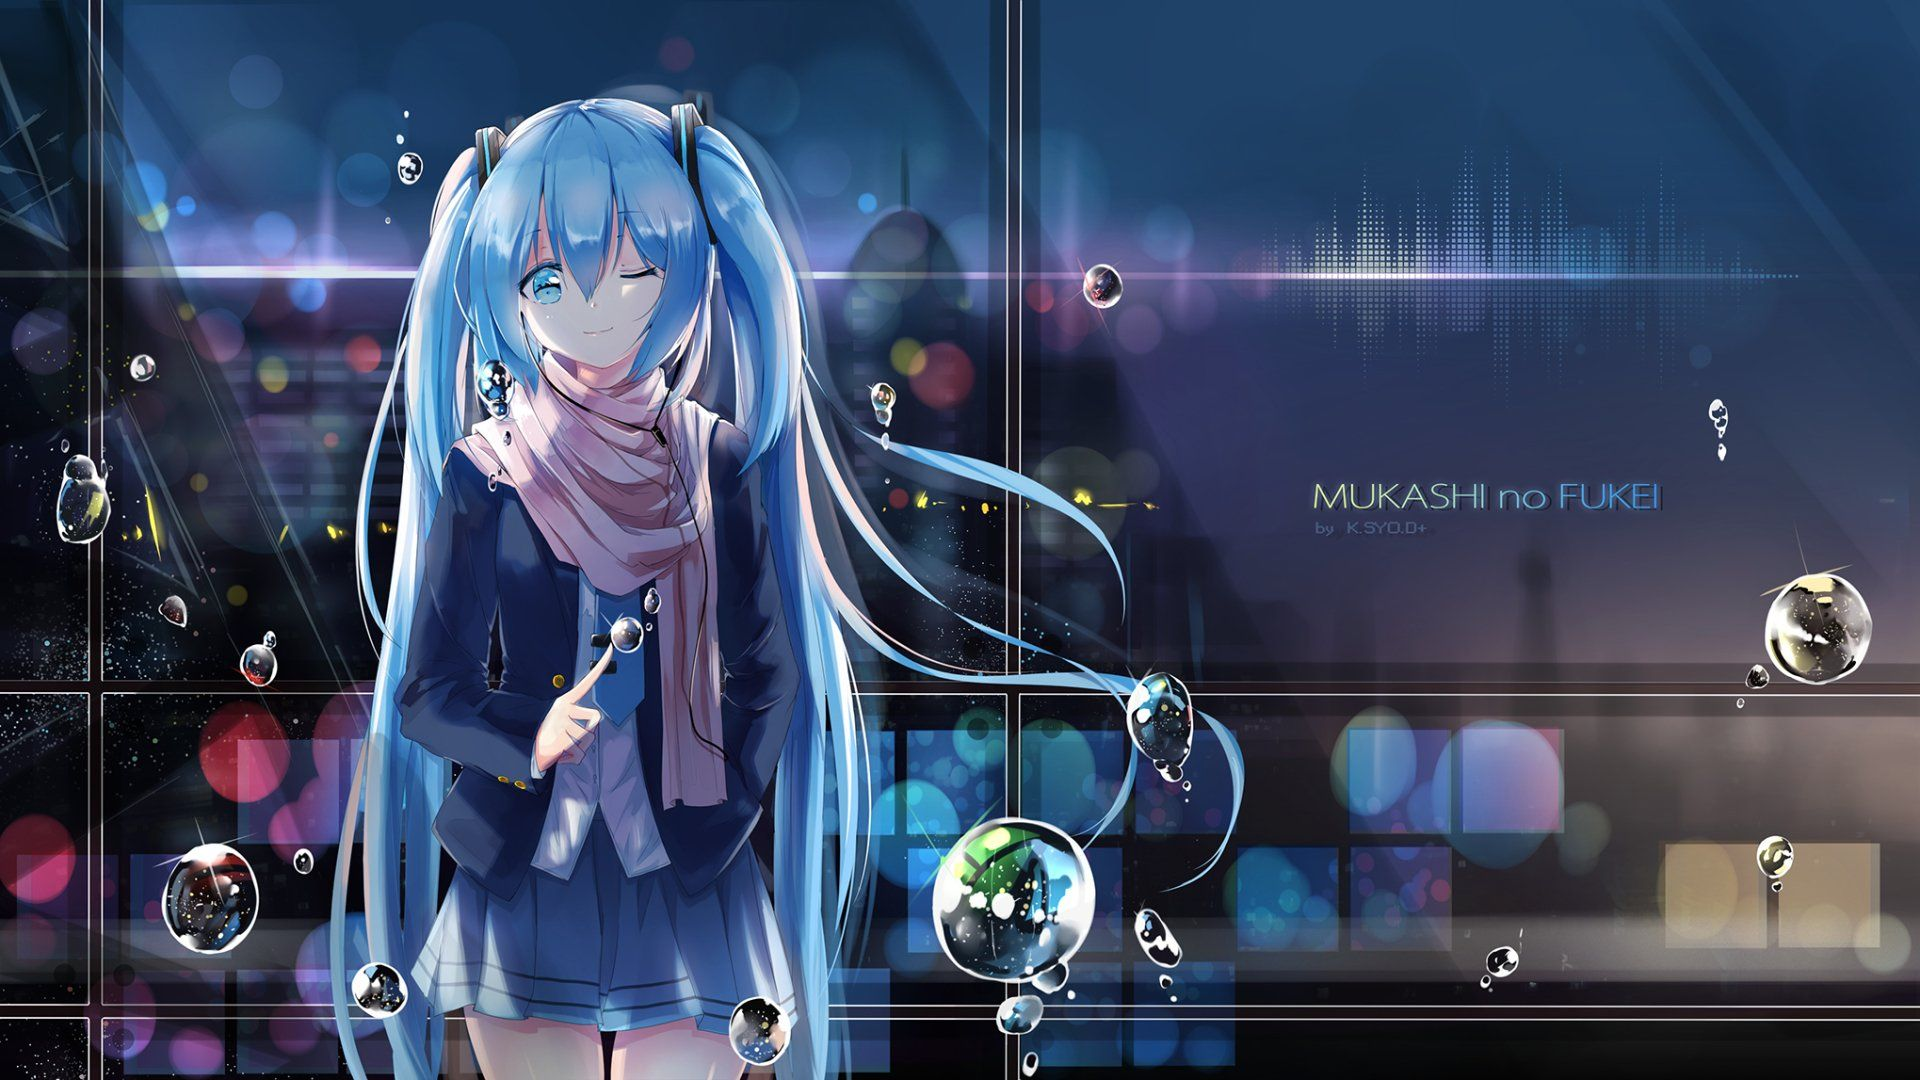 Anime Vocaloid Hatsune Miku Wallpaper Fondos De Pantalla Hd Fondos De Escritorio Fondos De Pantalla